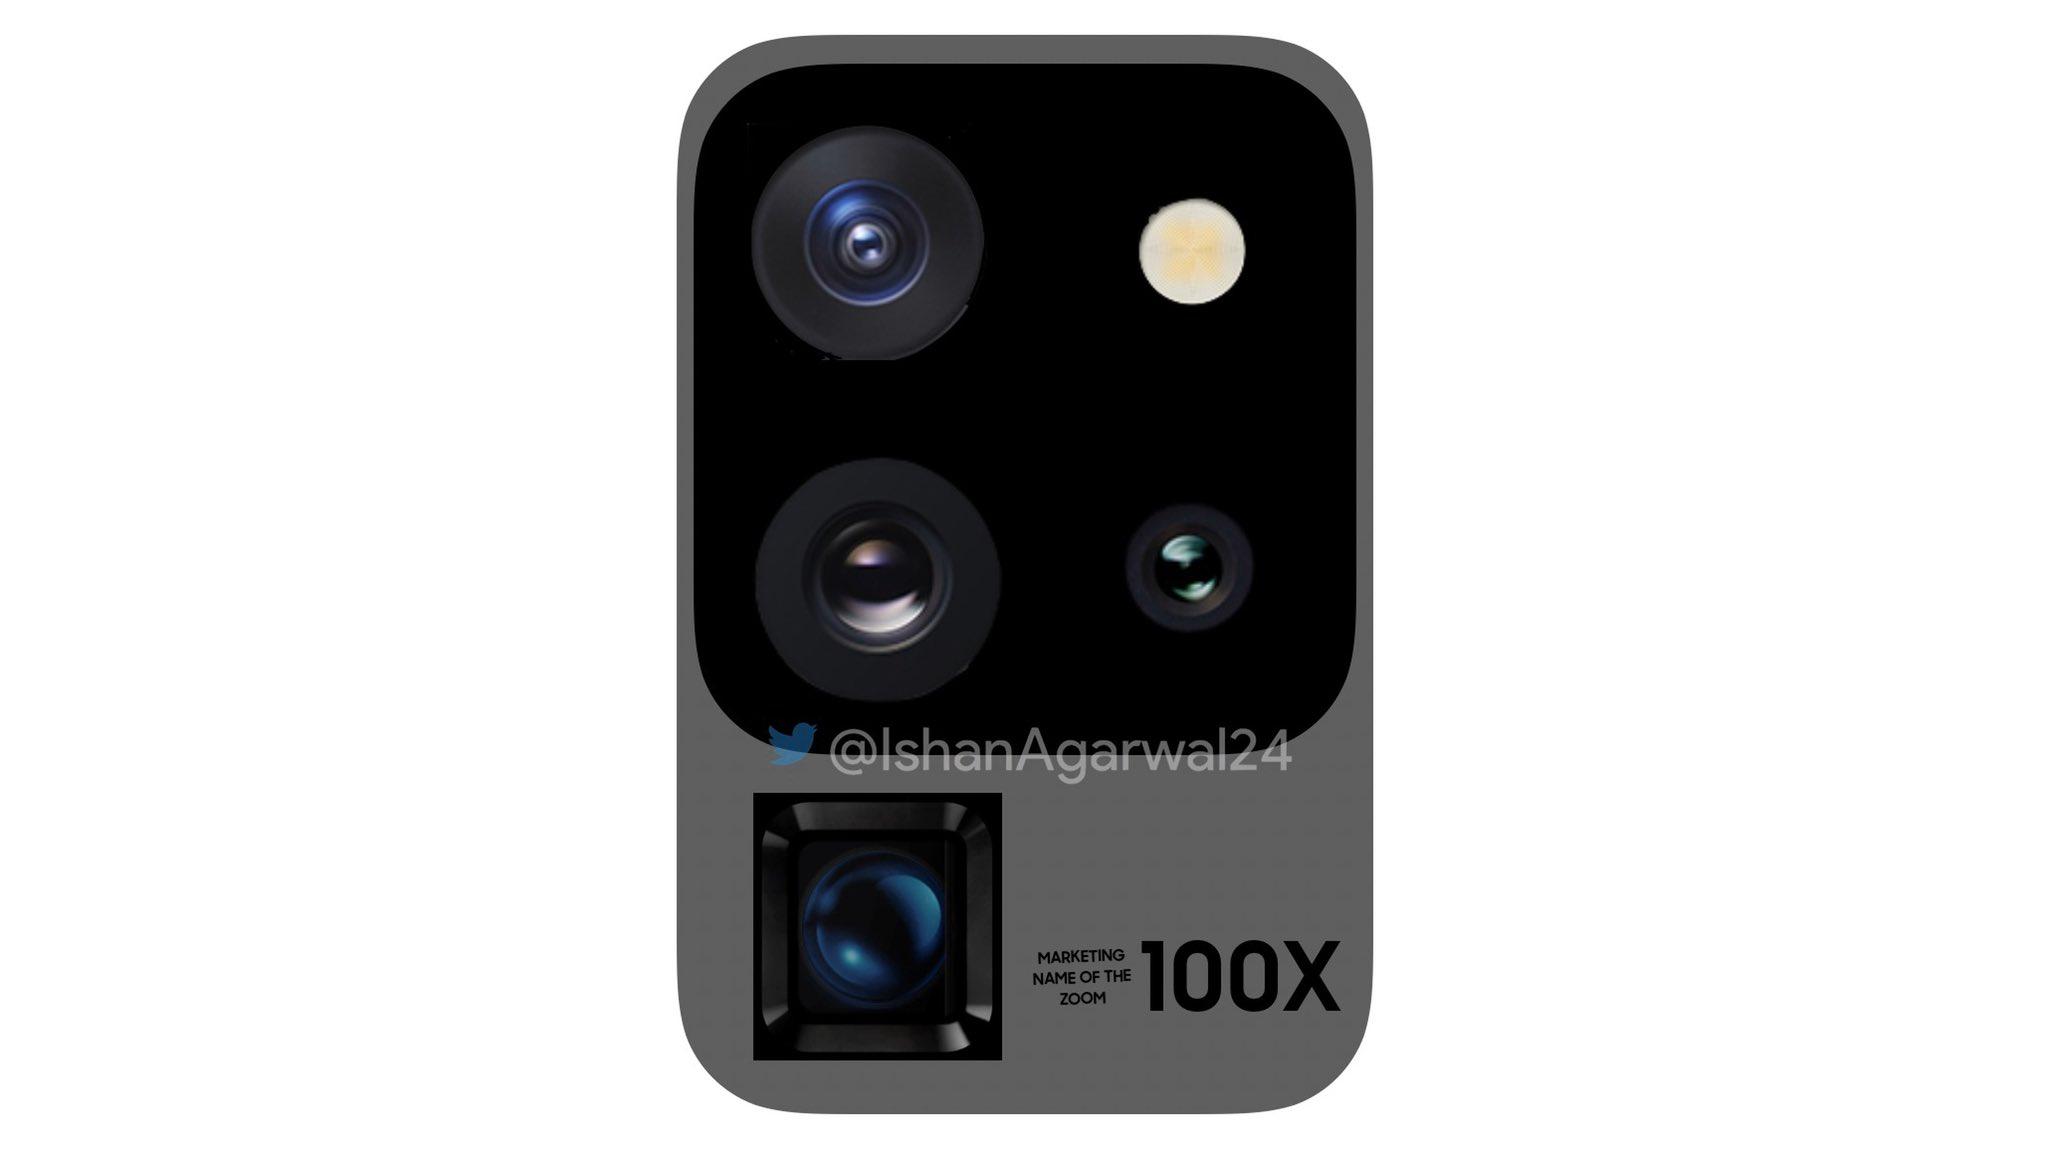 Galaxy S20 Ultra 100x Zoom